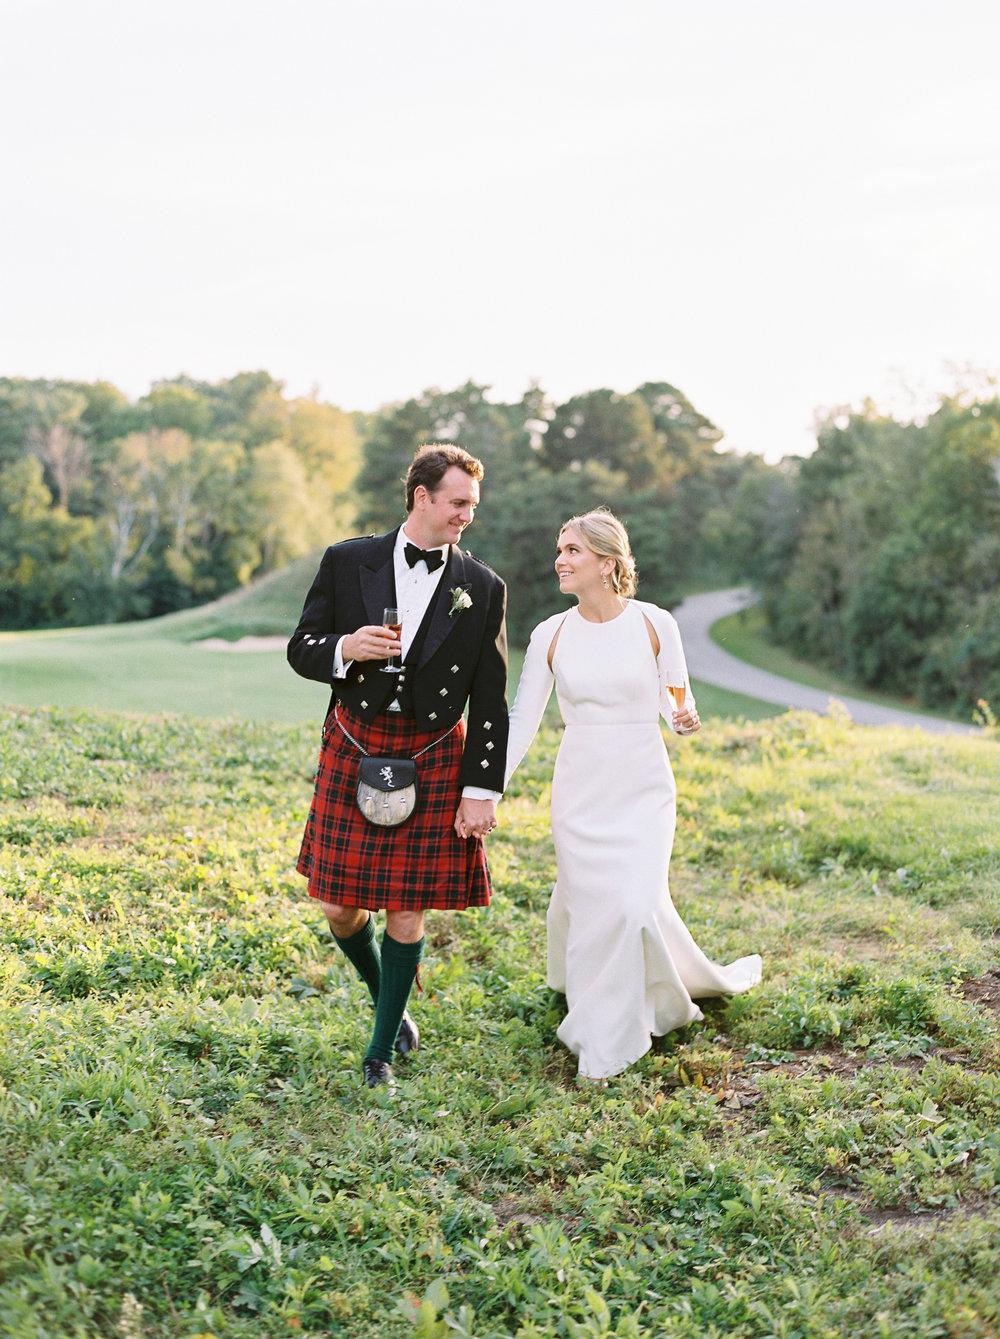 0592-Geneva-Ian-Wedding-Toronto Golf Club-When He Found Her-TorontoPhotographer.jpg